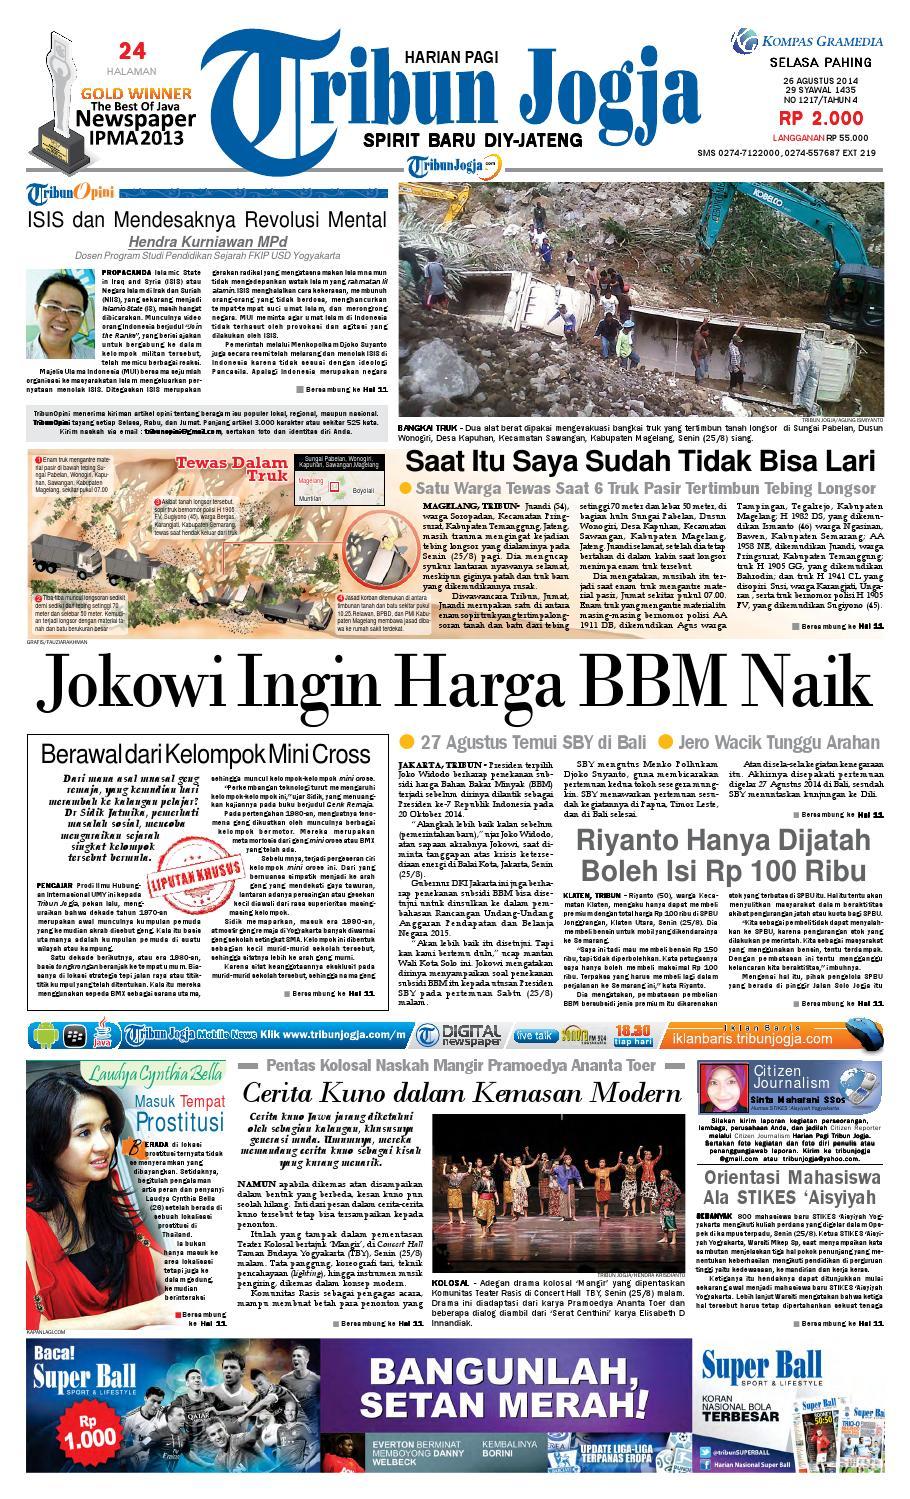 Tribunjogja 26 08 2014 By Tribun Jogja Issuu Tcash Vaganza 36 Produk Ukm Bumn Batik Print Motif3